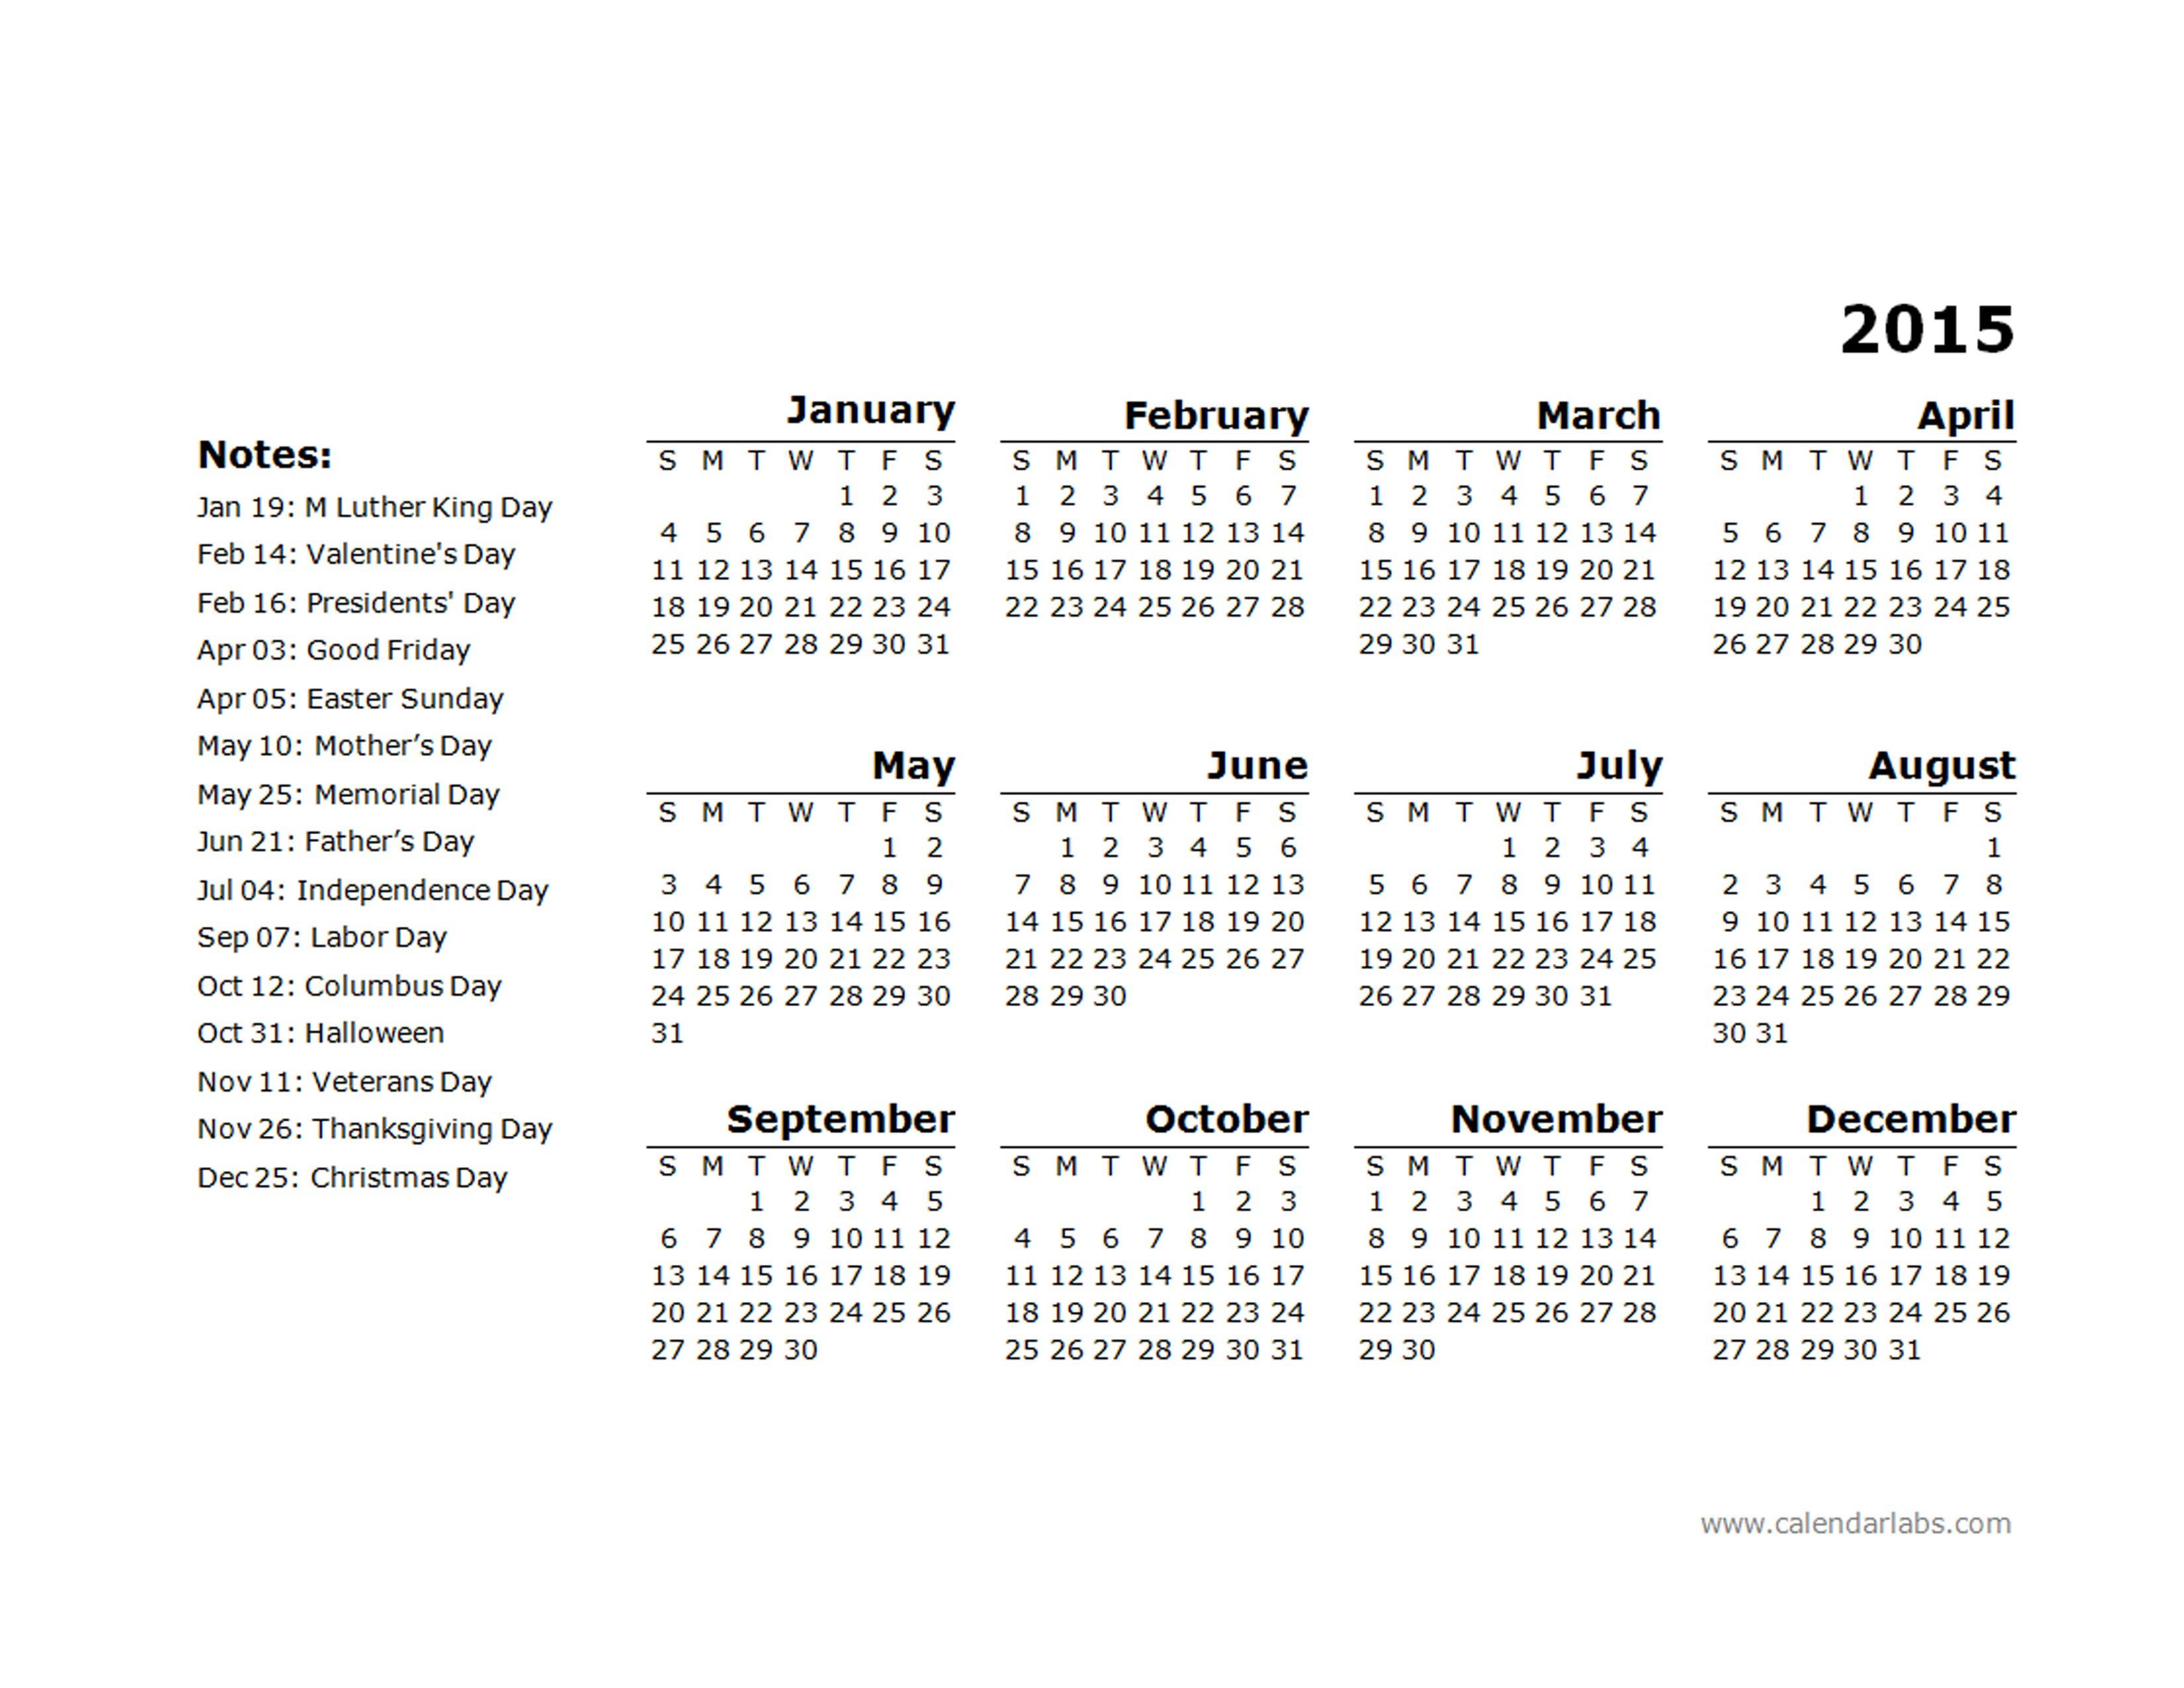 Free Calendar Templates 2015 South Africa | Free Blank Calendar for Christmas Calendar Printable Template